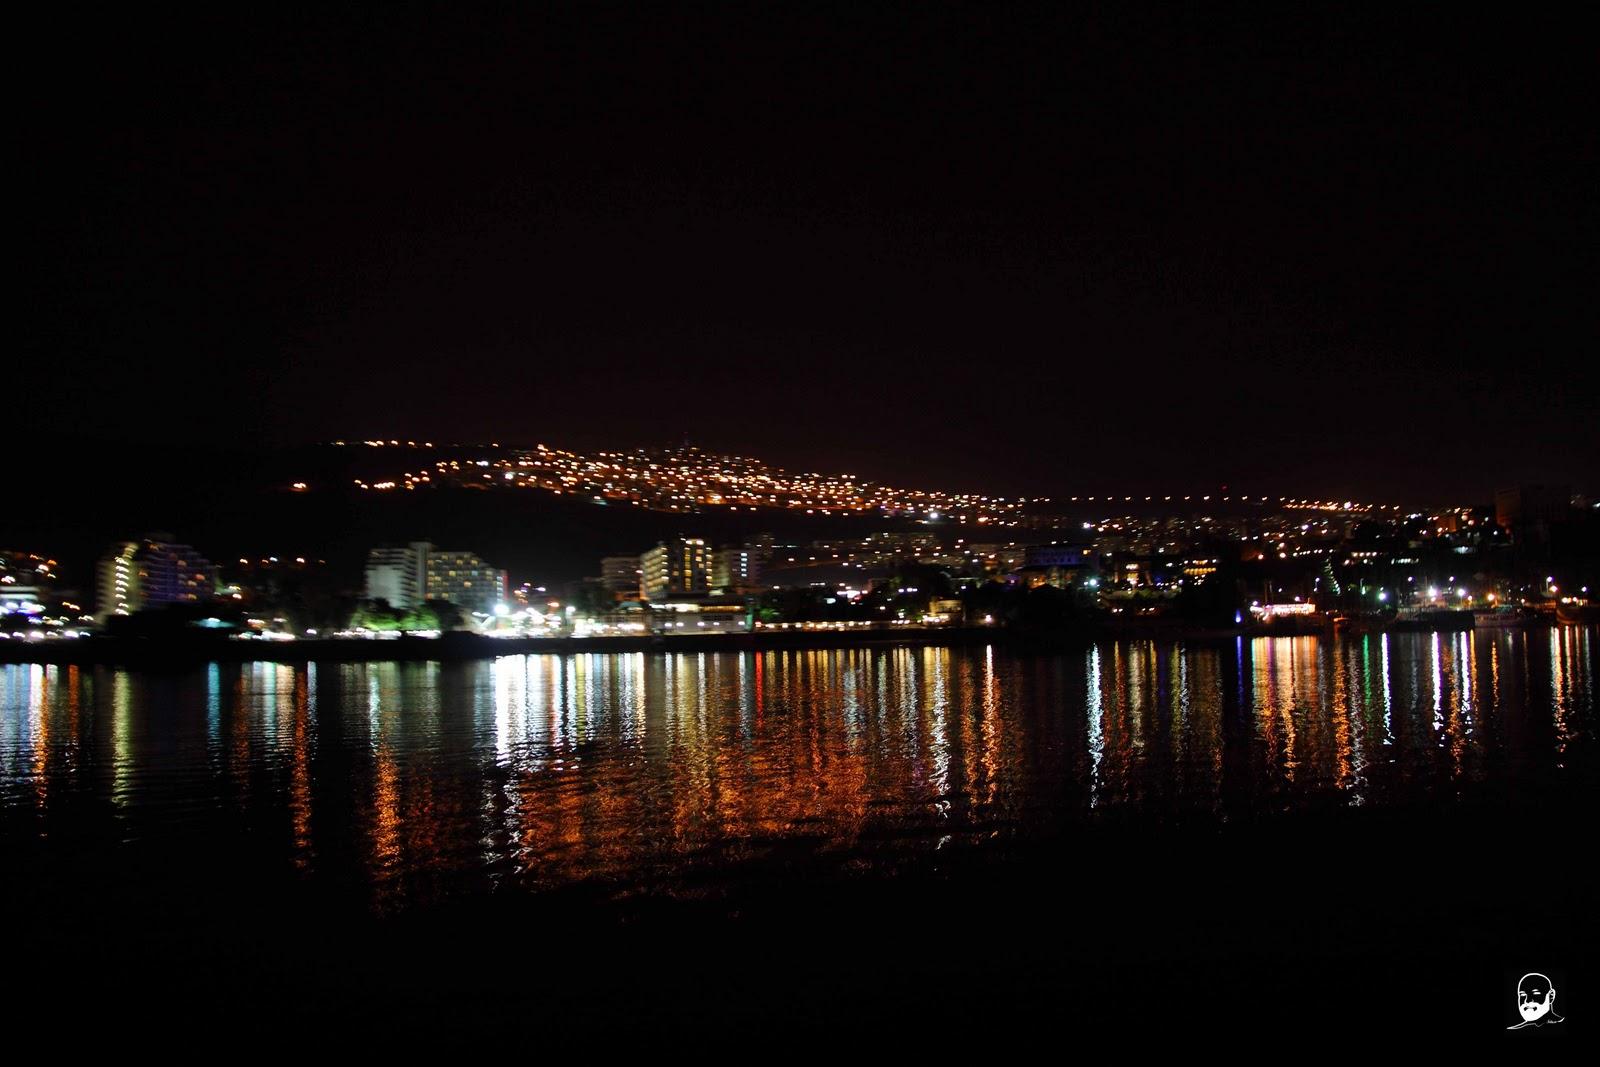 http://3.bp.blogspot.com/-mj9MYnLnwI0/Tvn-aiQebOI/AAAAAAAADvY/skOt8Kc76uk/s1600/tiberias+noche.jpg